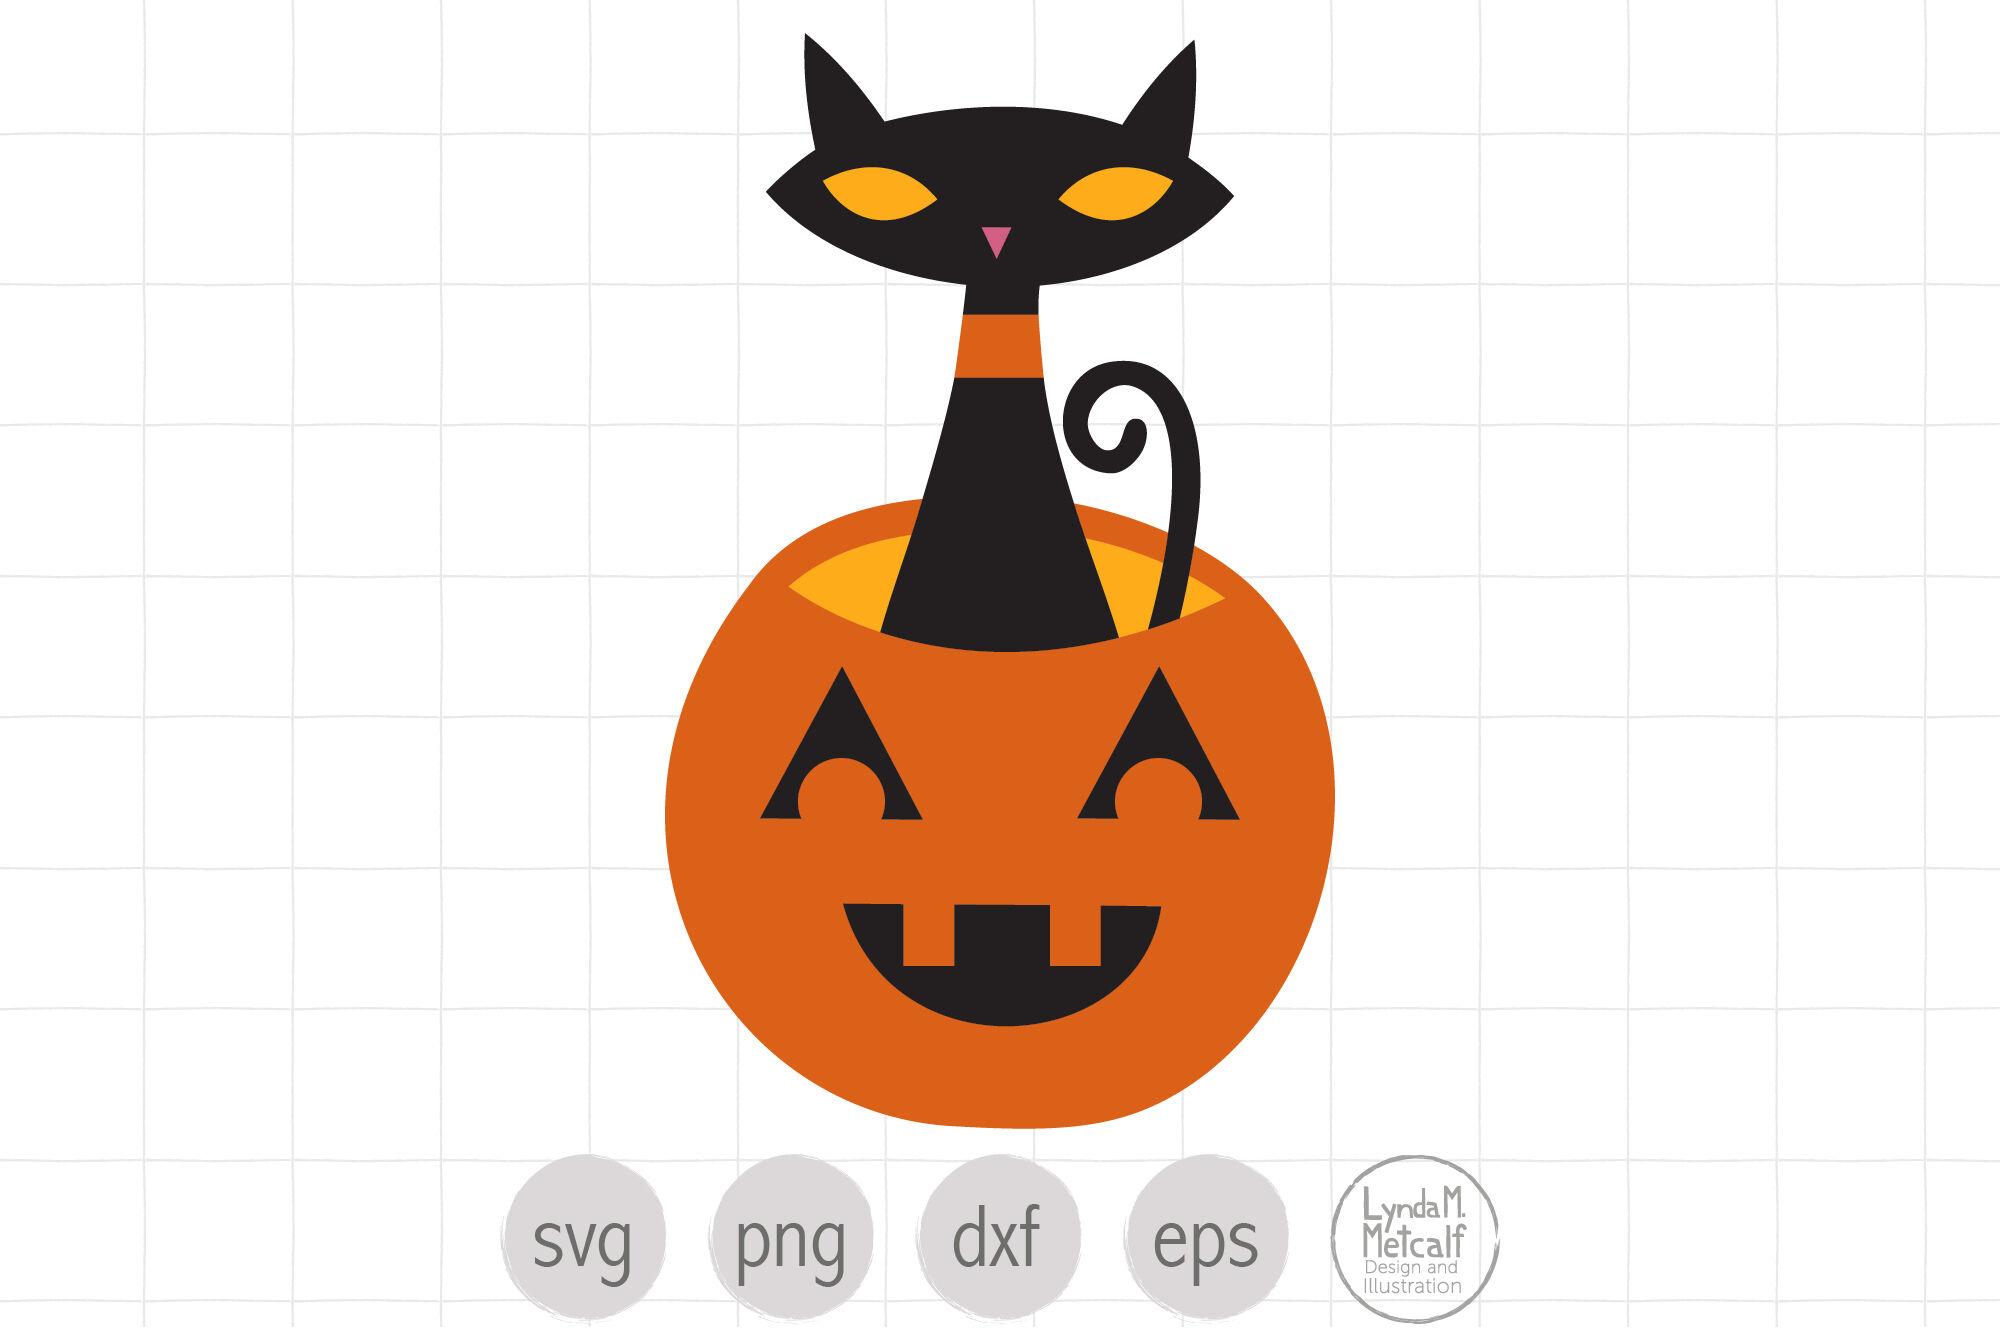 Black Cat In Jack O Lantern Svg For Halloween By Lyndammetcalf Thehungryjpeg Com